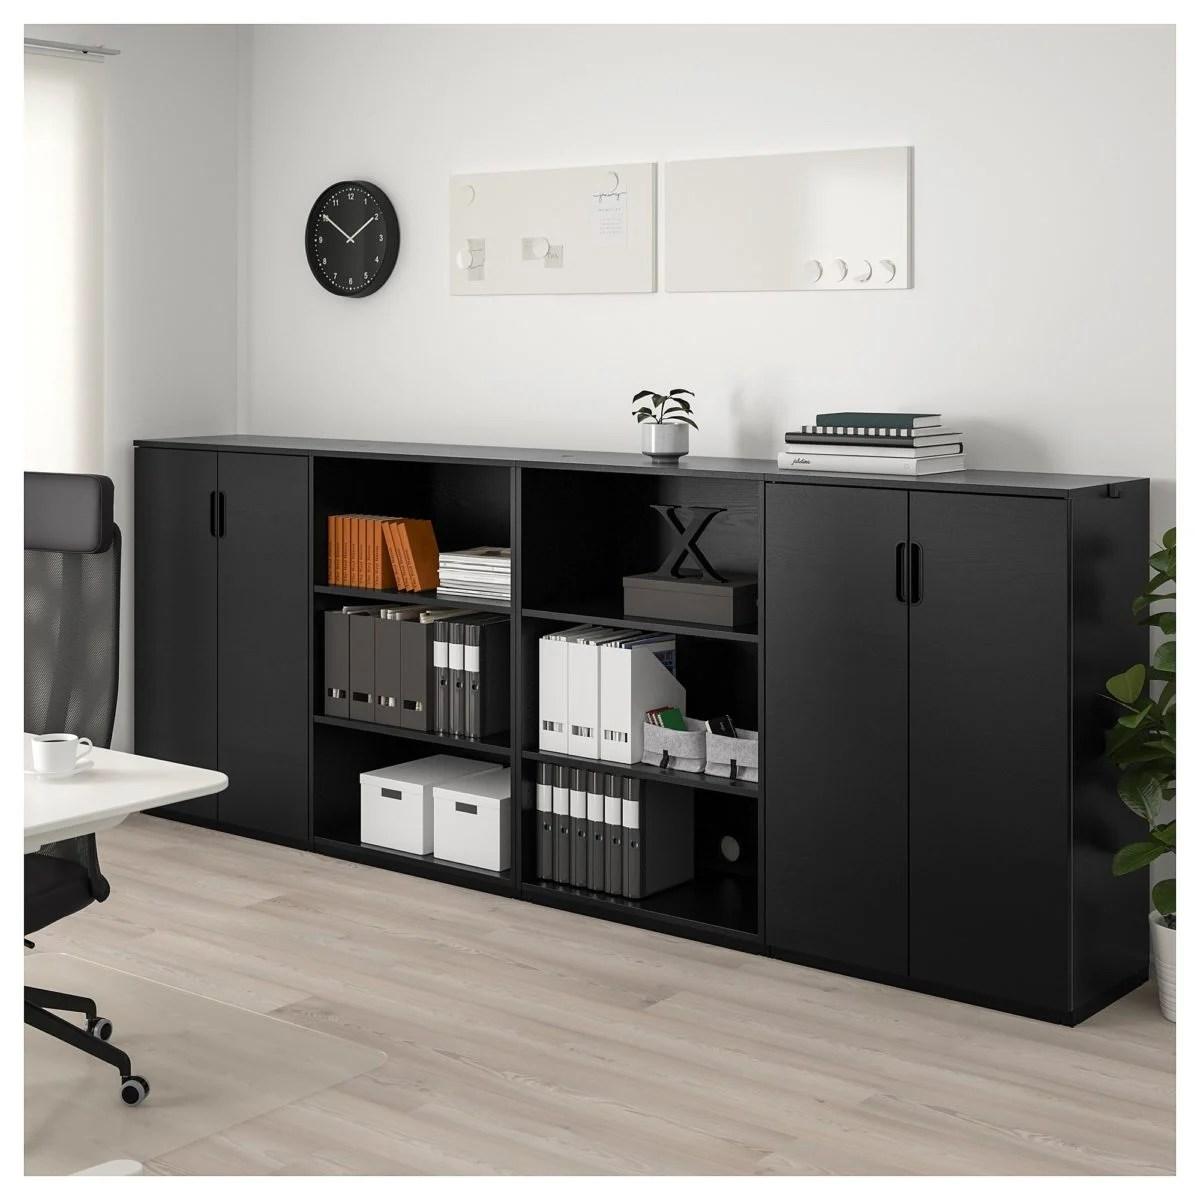 Ikea Catalogo Ufficio 2019